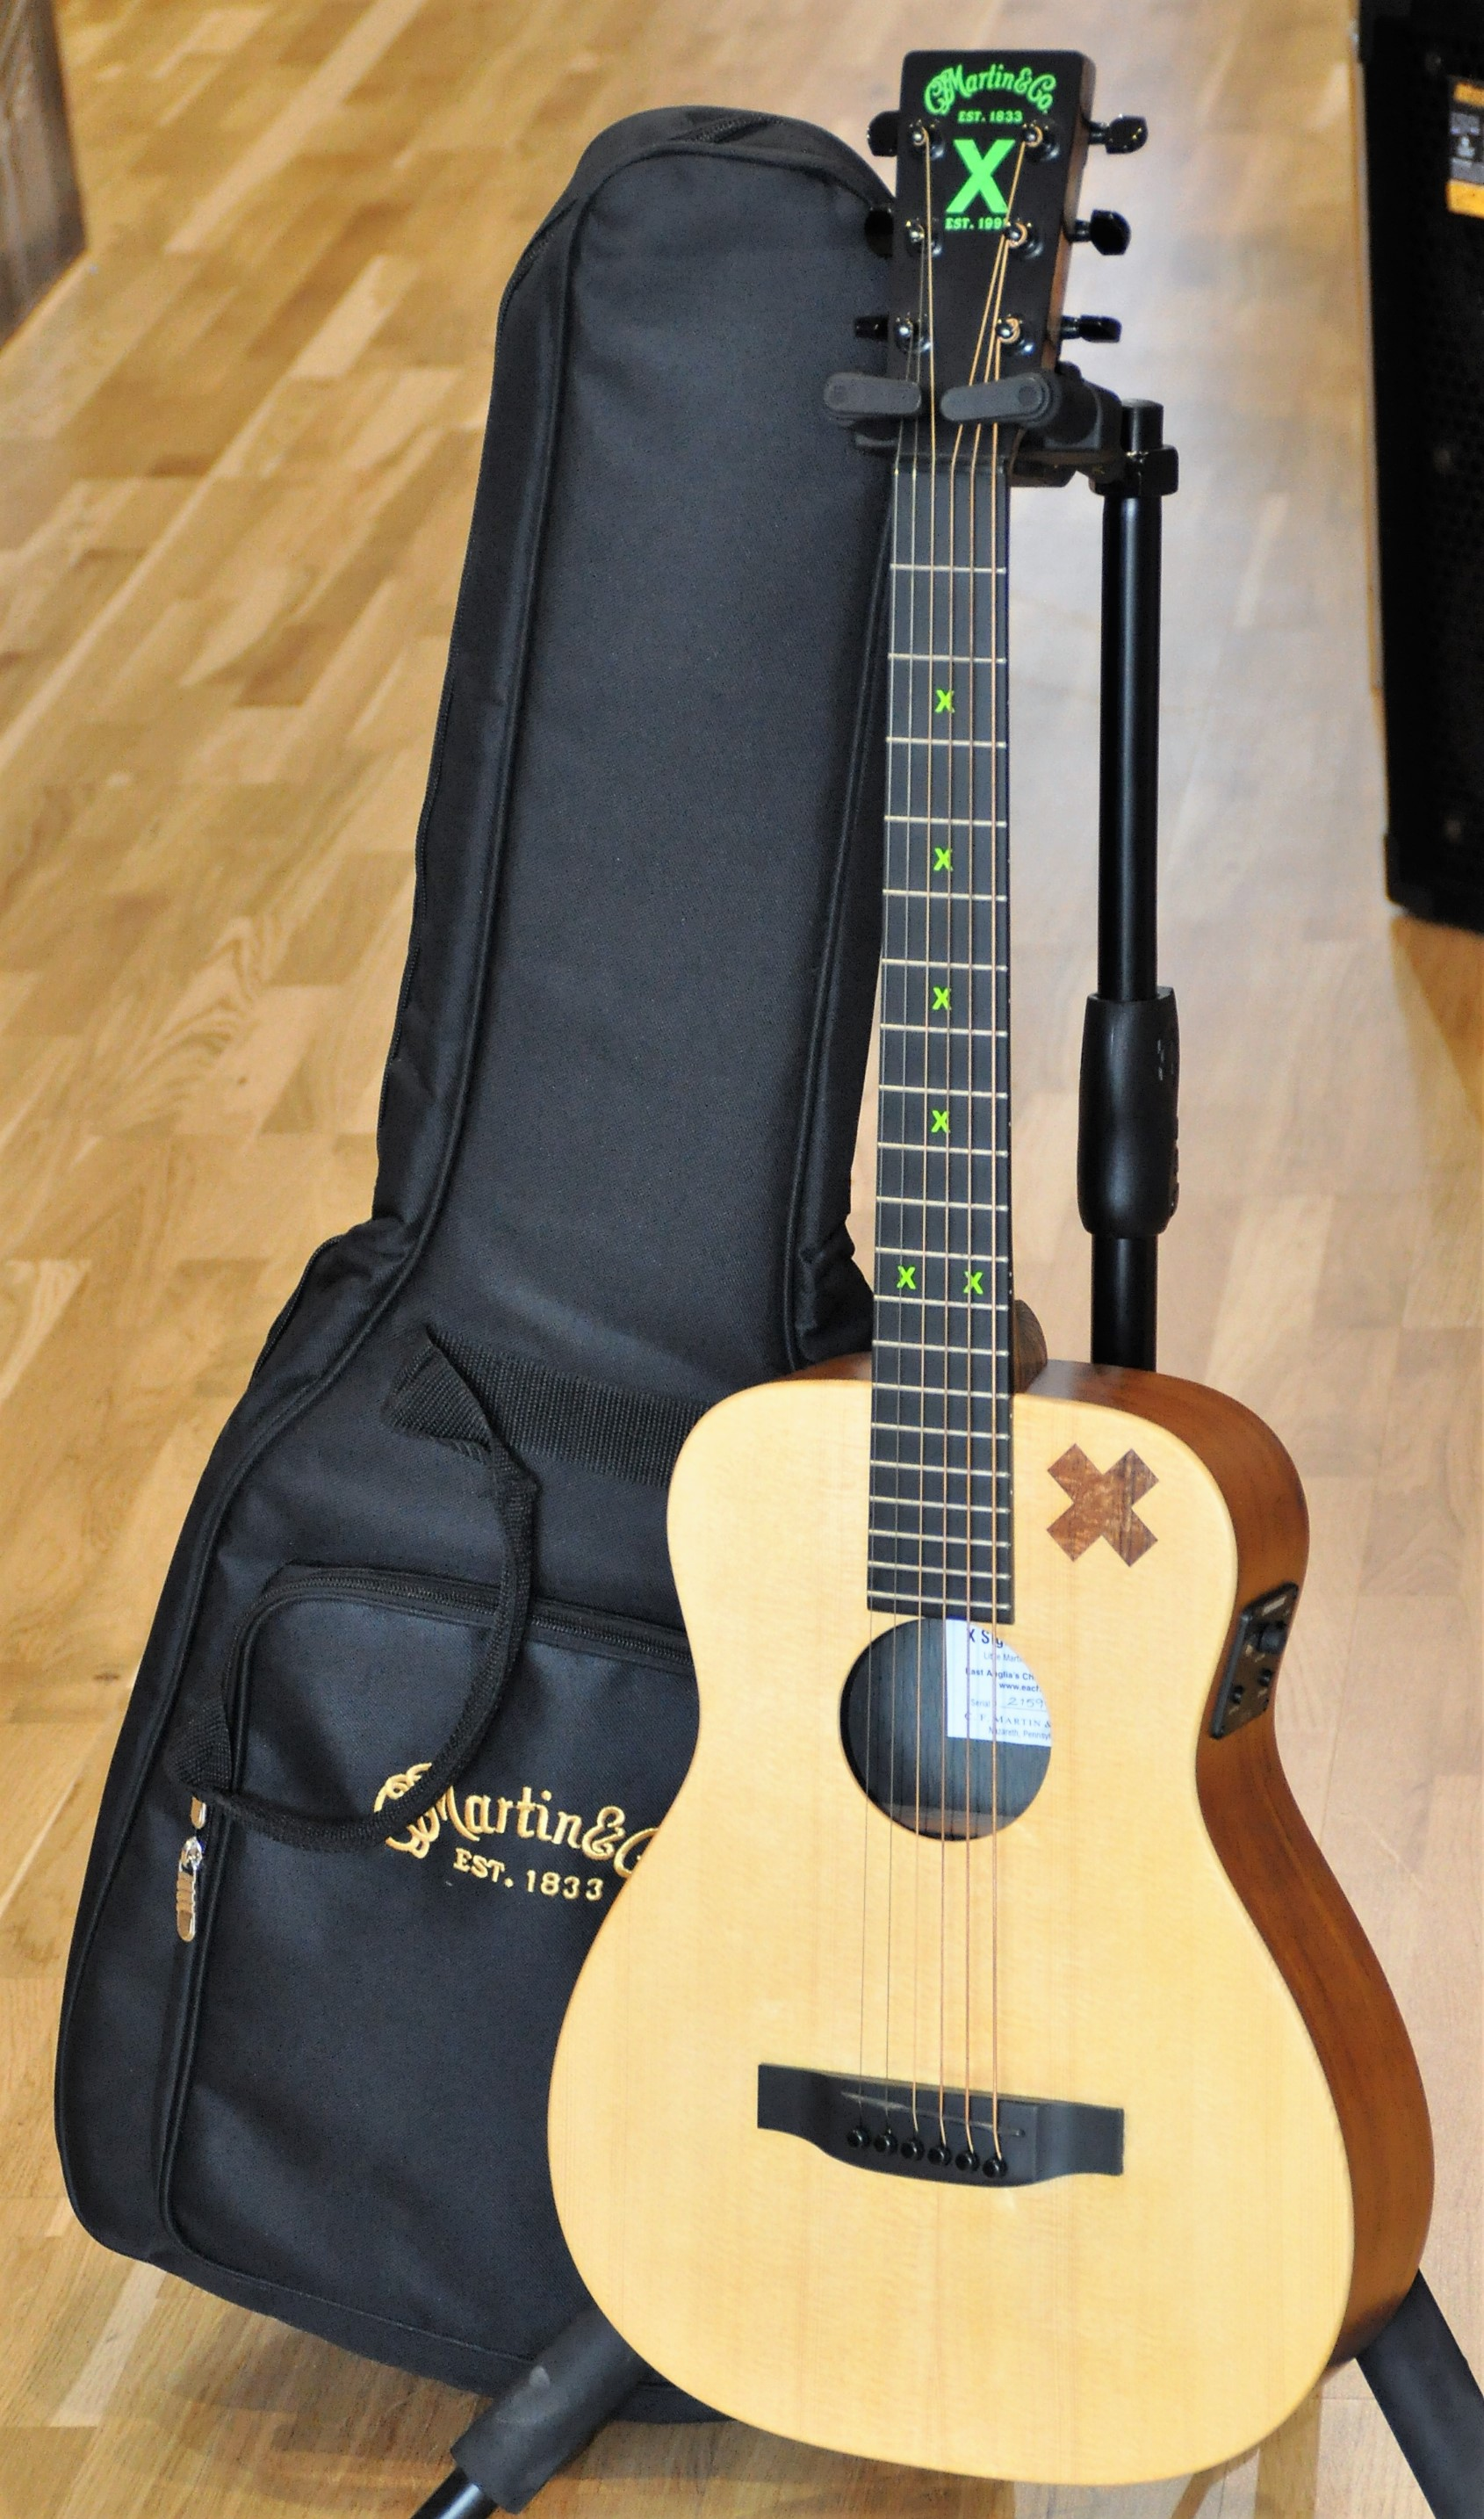 guitare electro martin co ed sheeran 2 gaucher ile de. Black Bedroom Furniture Sets. Home Design Ideas